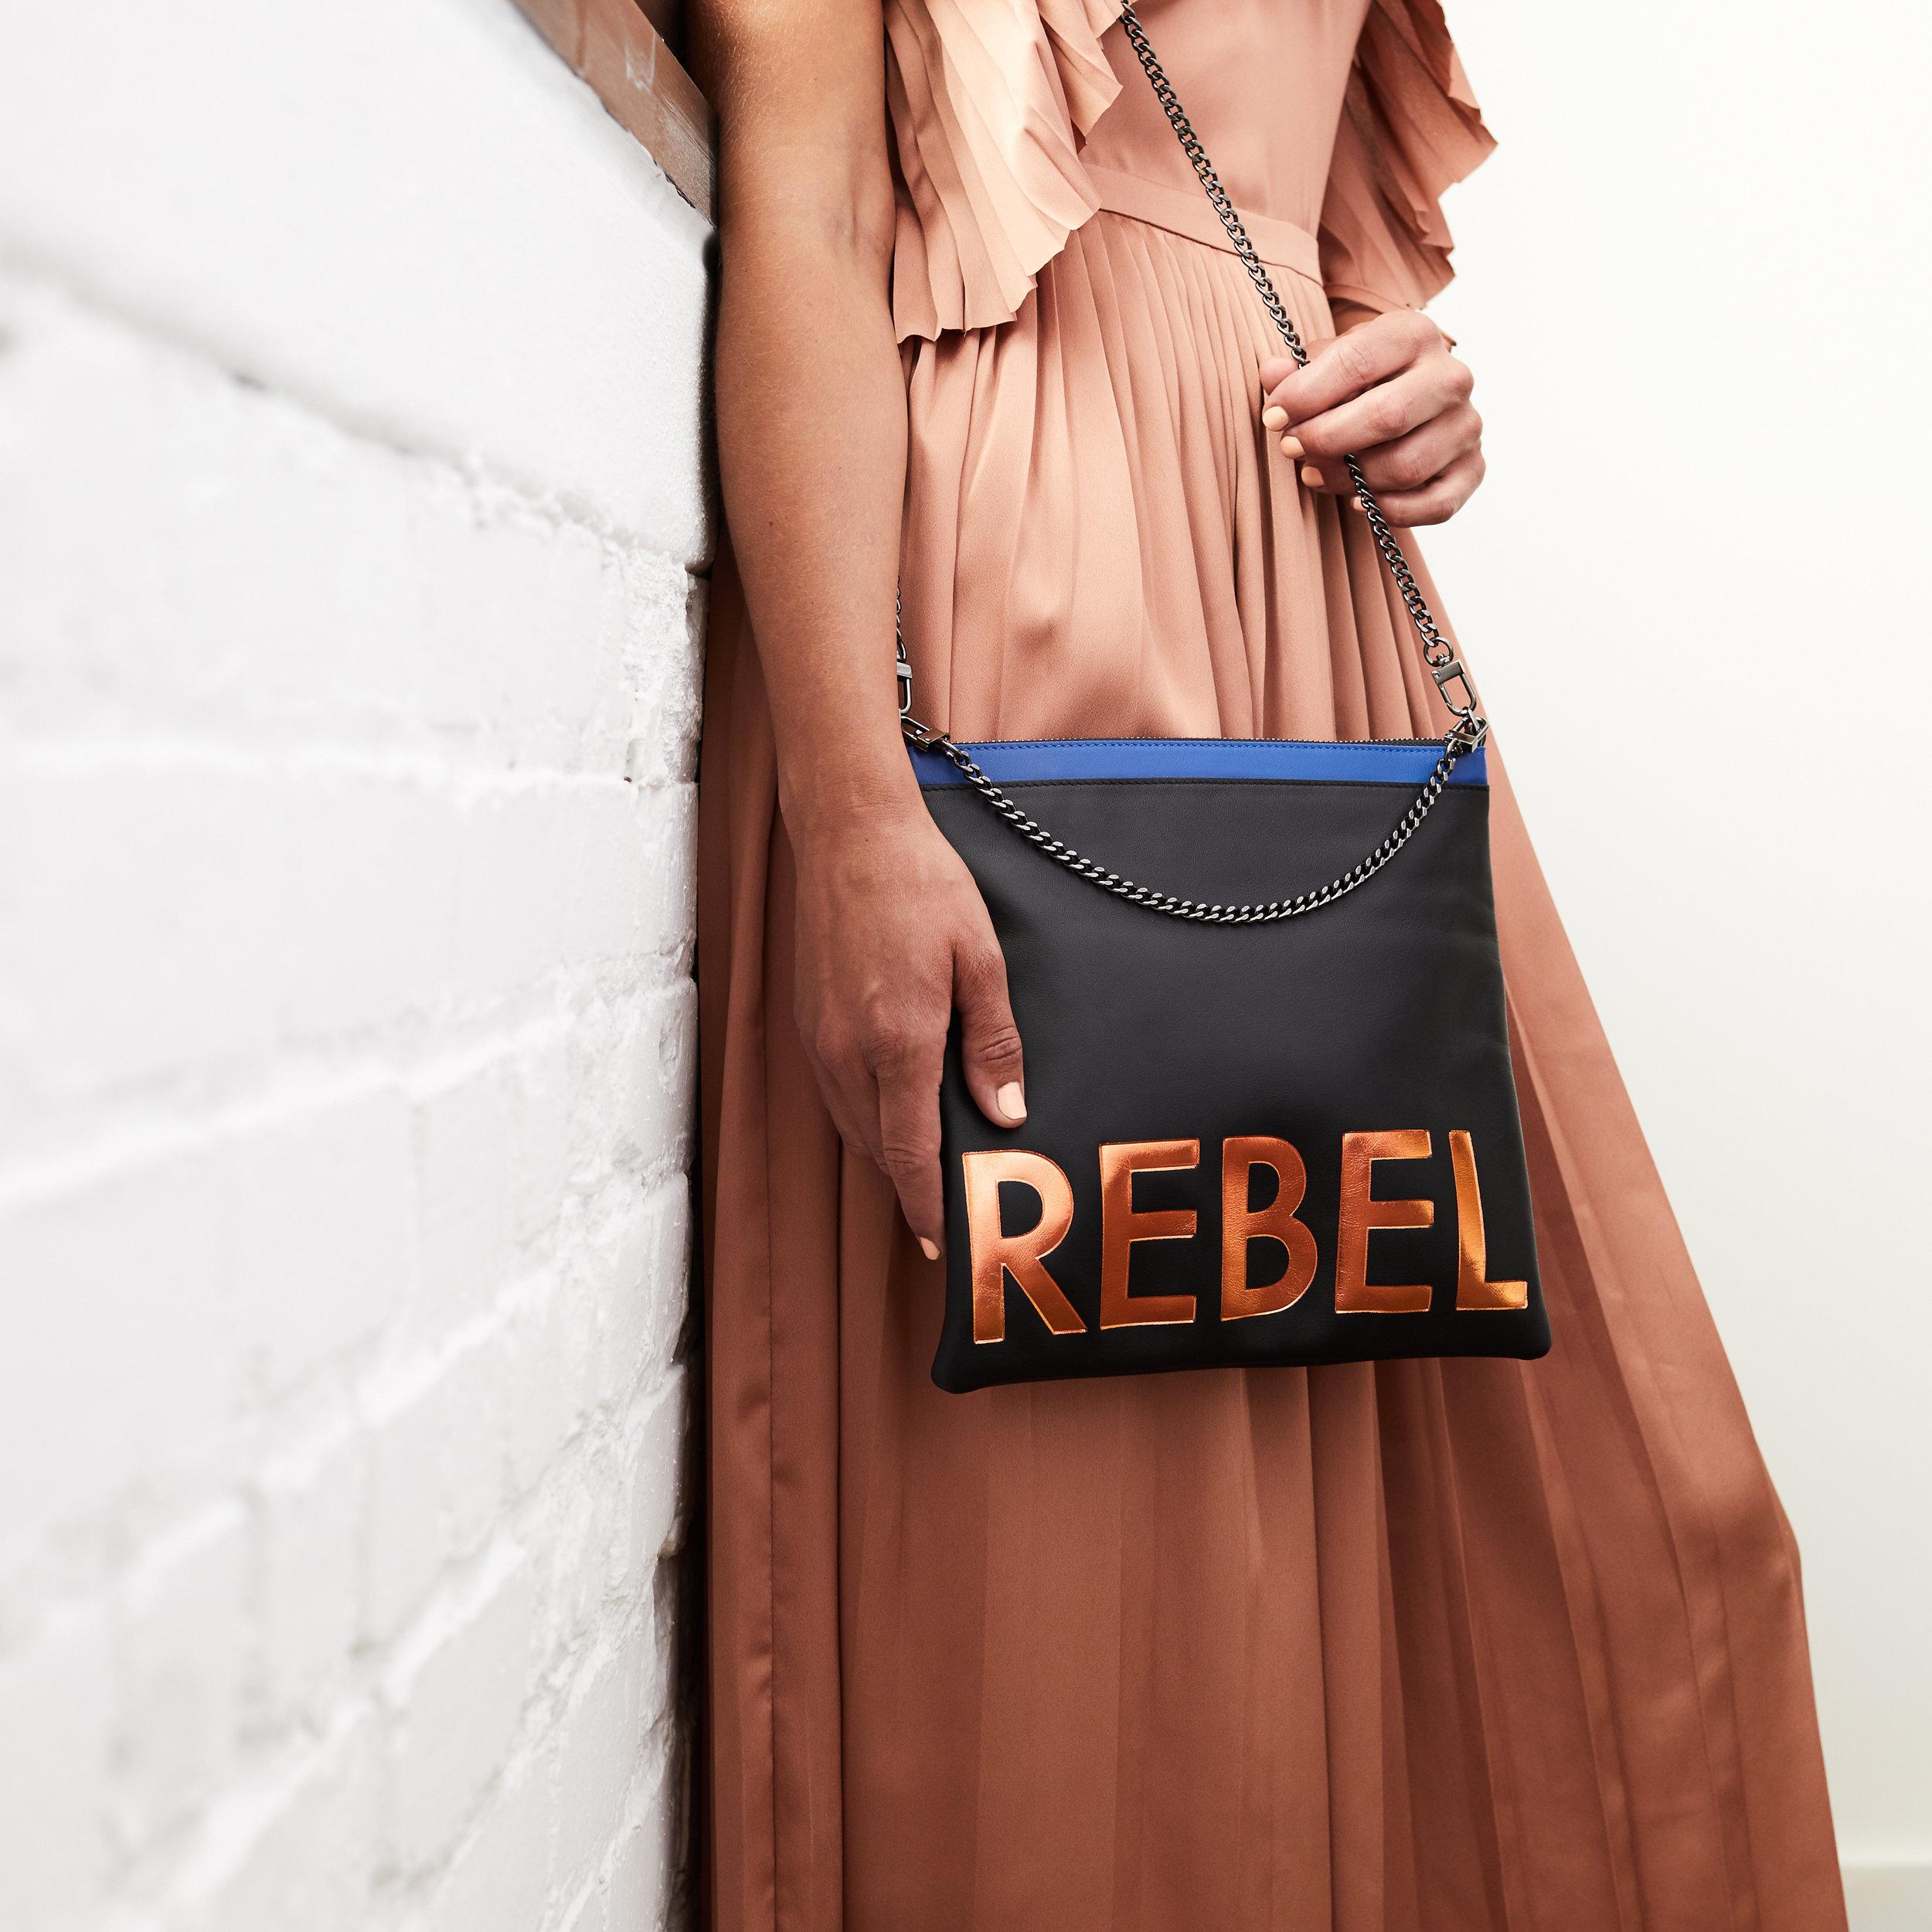 Rebel_MixedMetal_E-0100.jpg